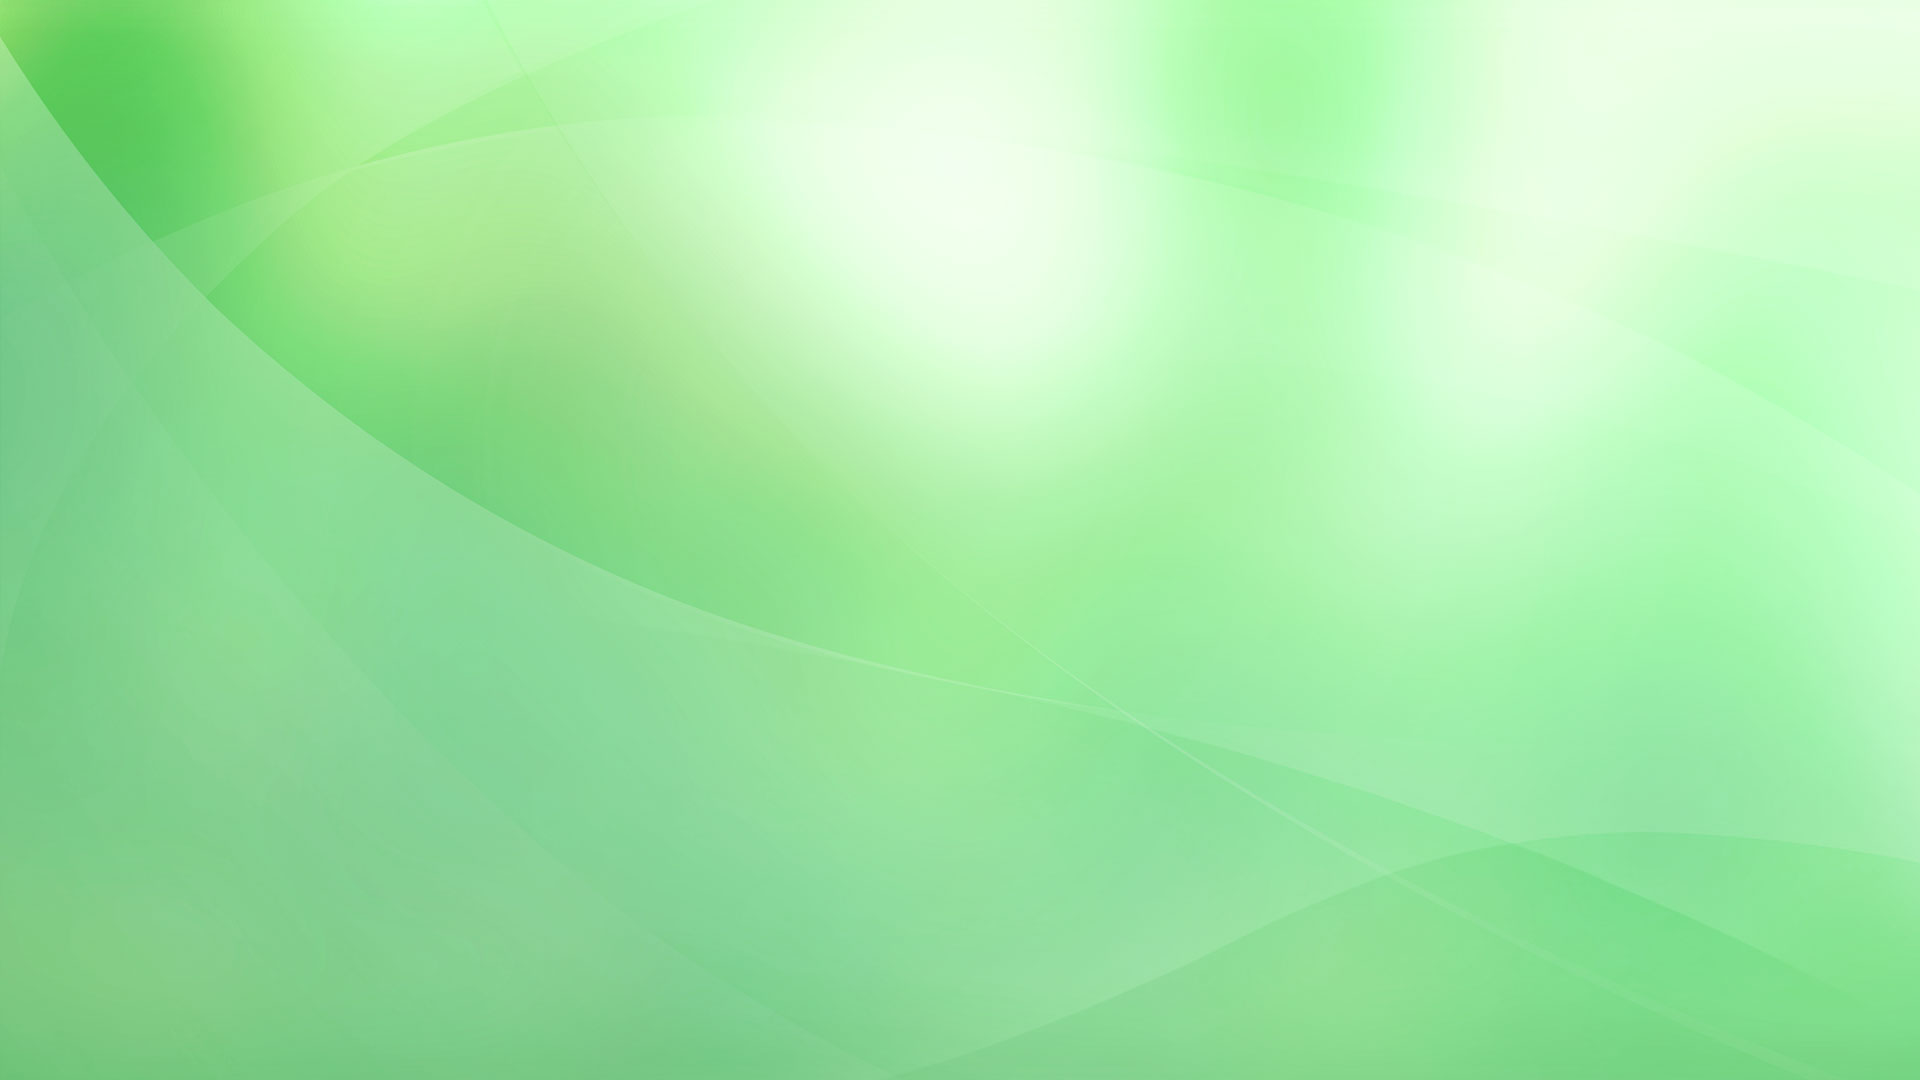 bgckground-image